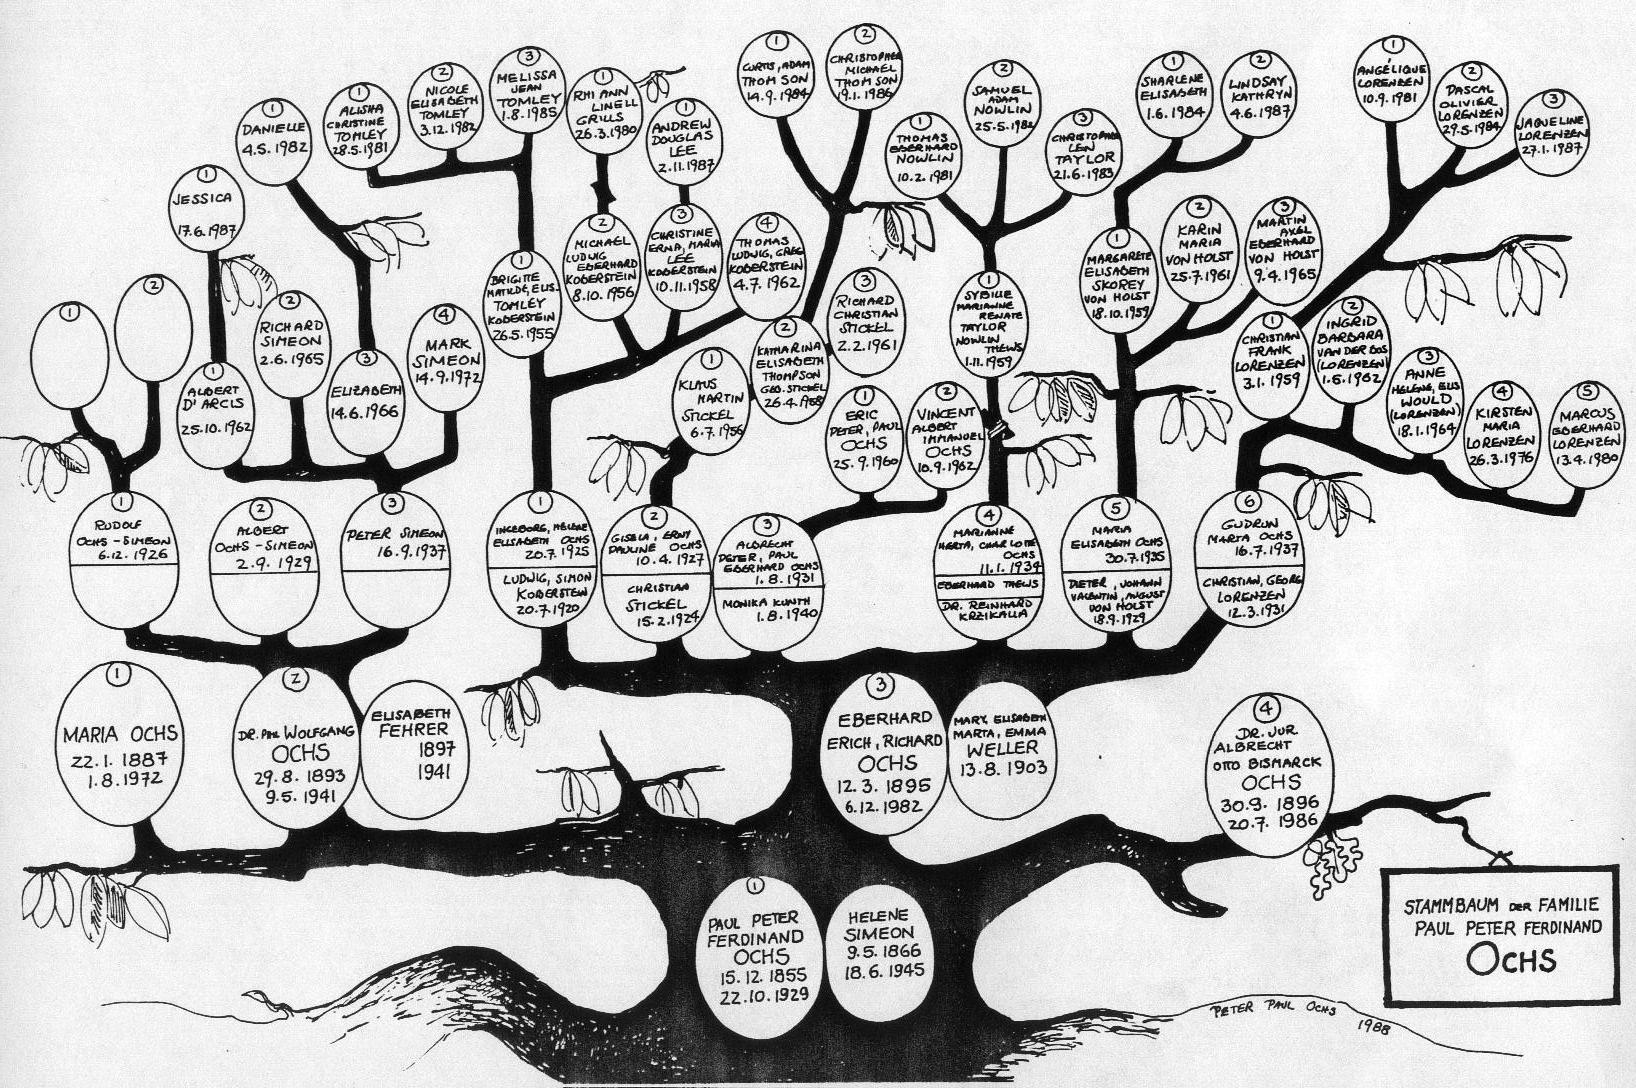 The Ochs Ancestry